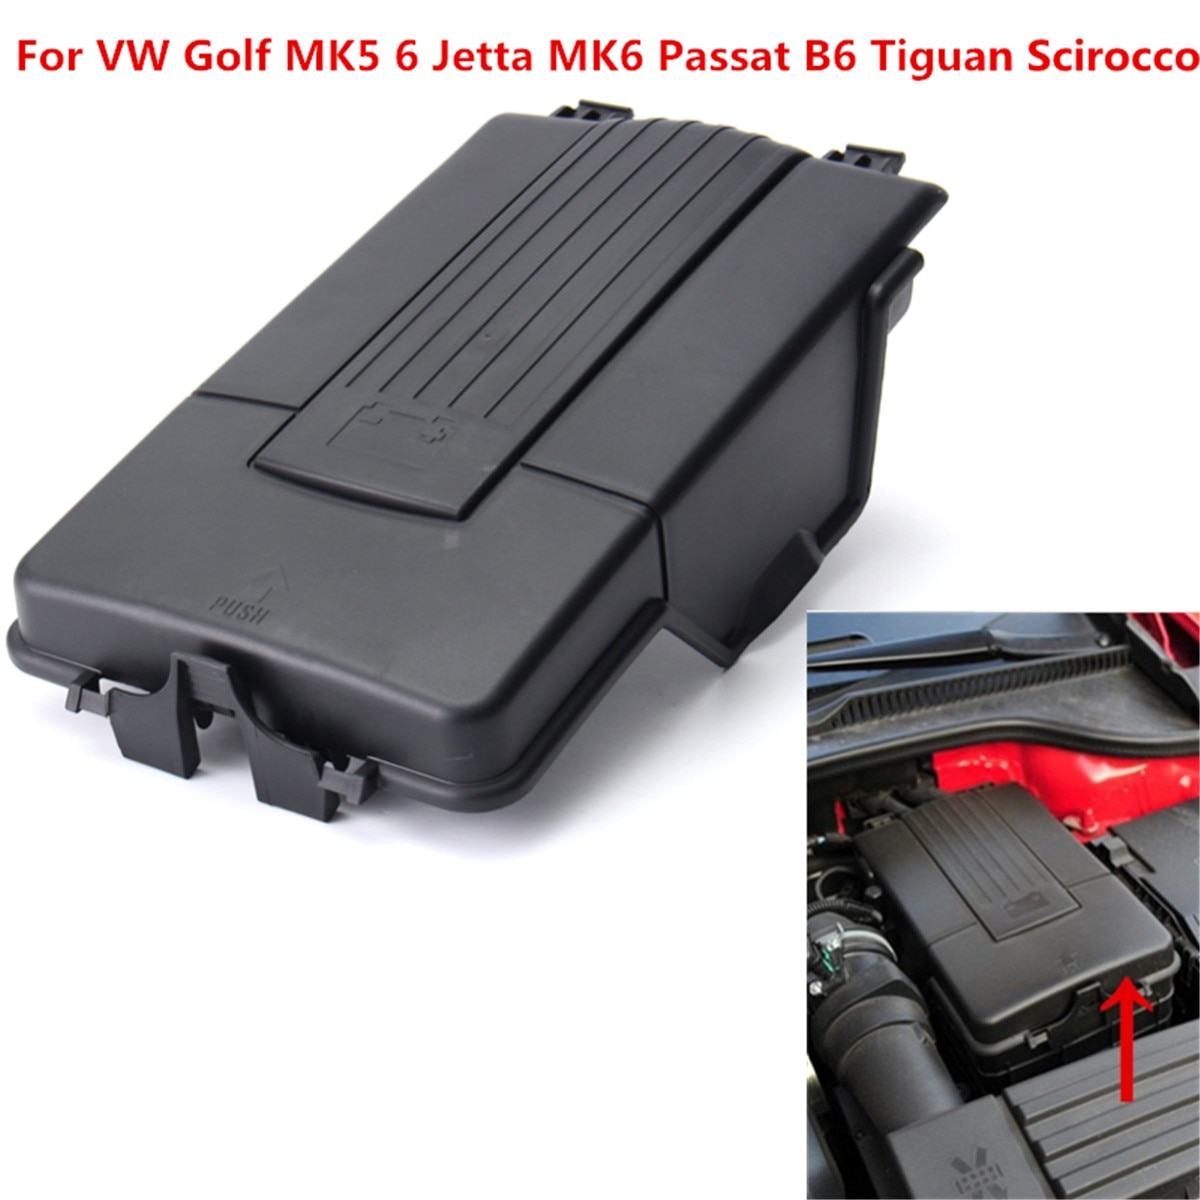 Car Battery Cover Top Lid Tray For VW Golf MK5 6 Jetta MK6 Passat B6 Tiguan Scirocco Plastic  1K0 915 443 A /3C0 915 443 A